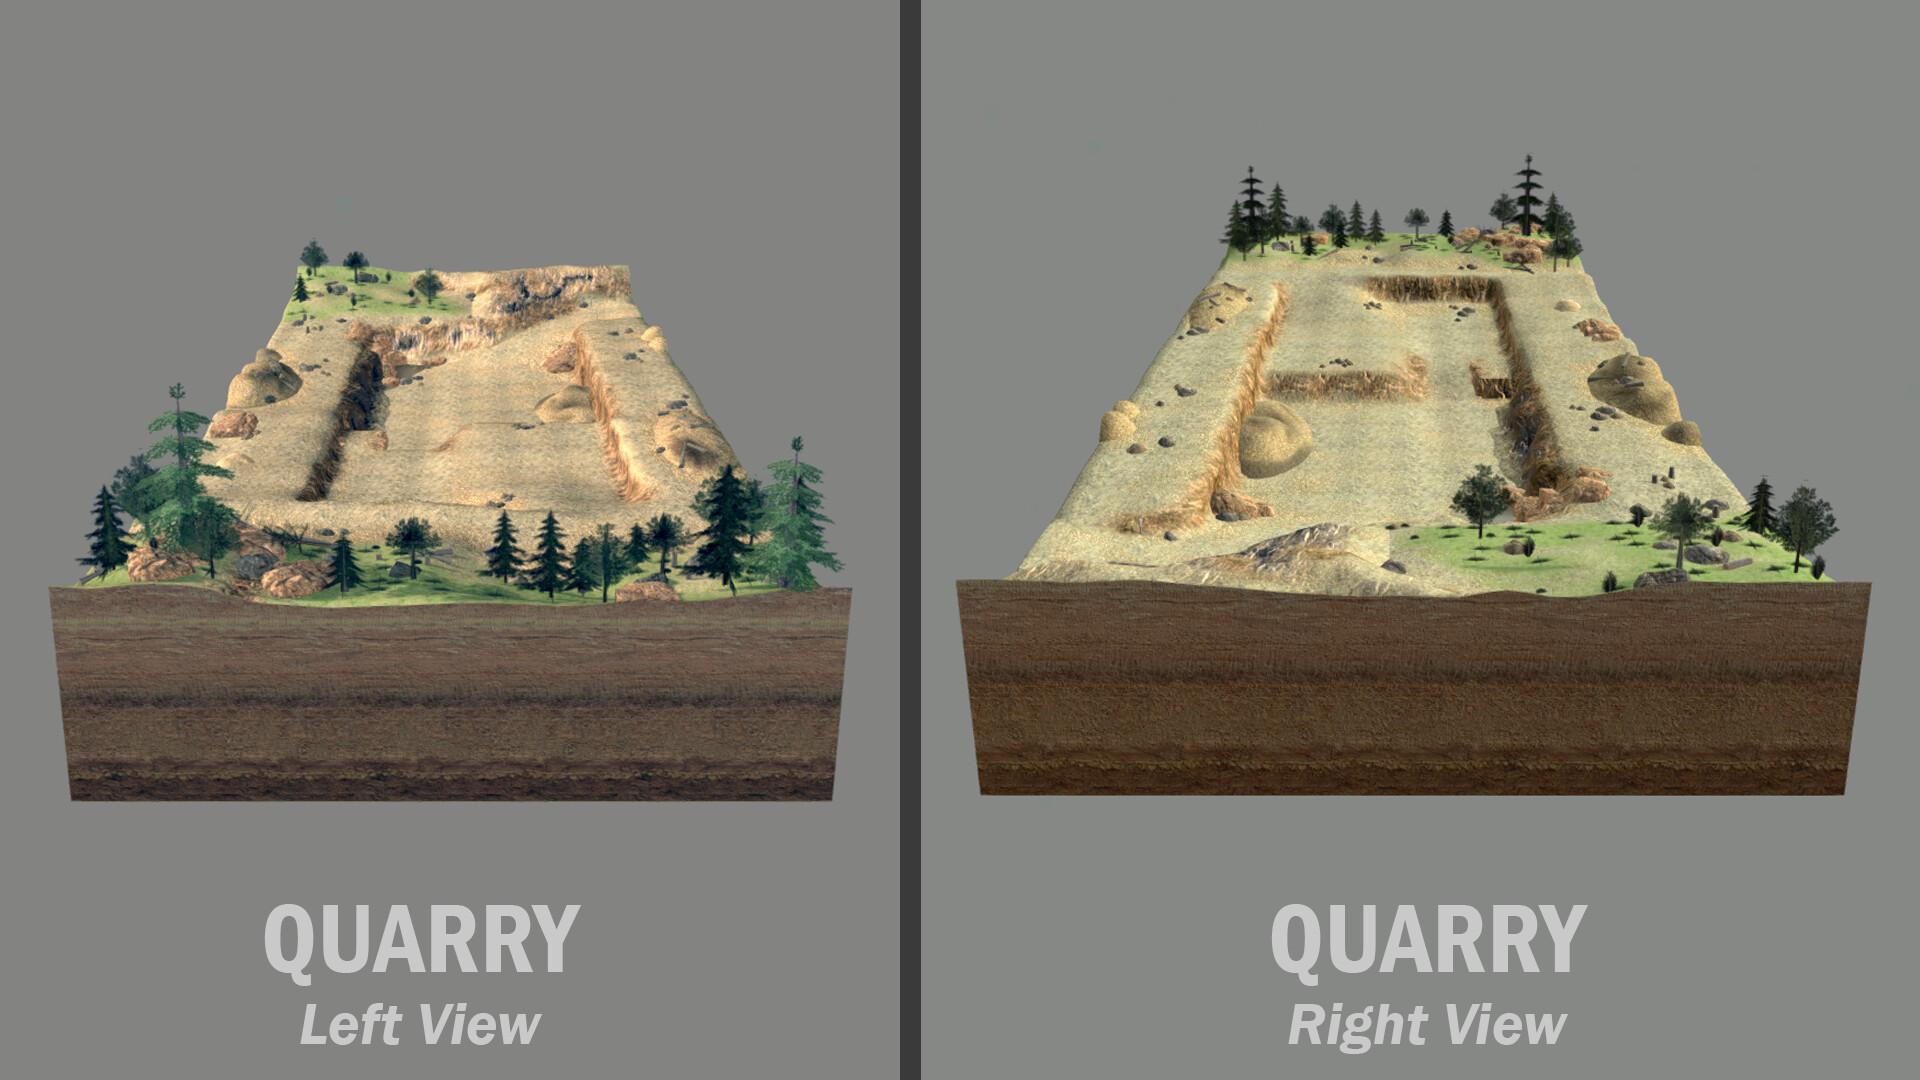 Jordan cameron quarry 31